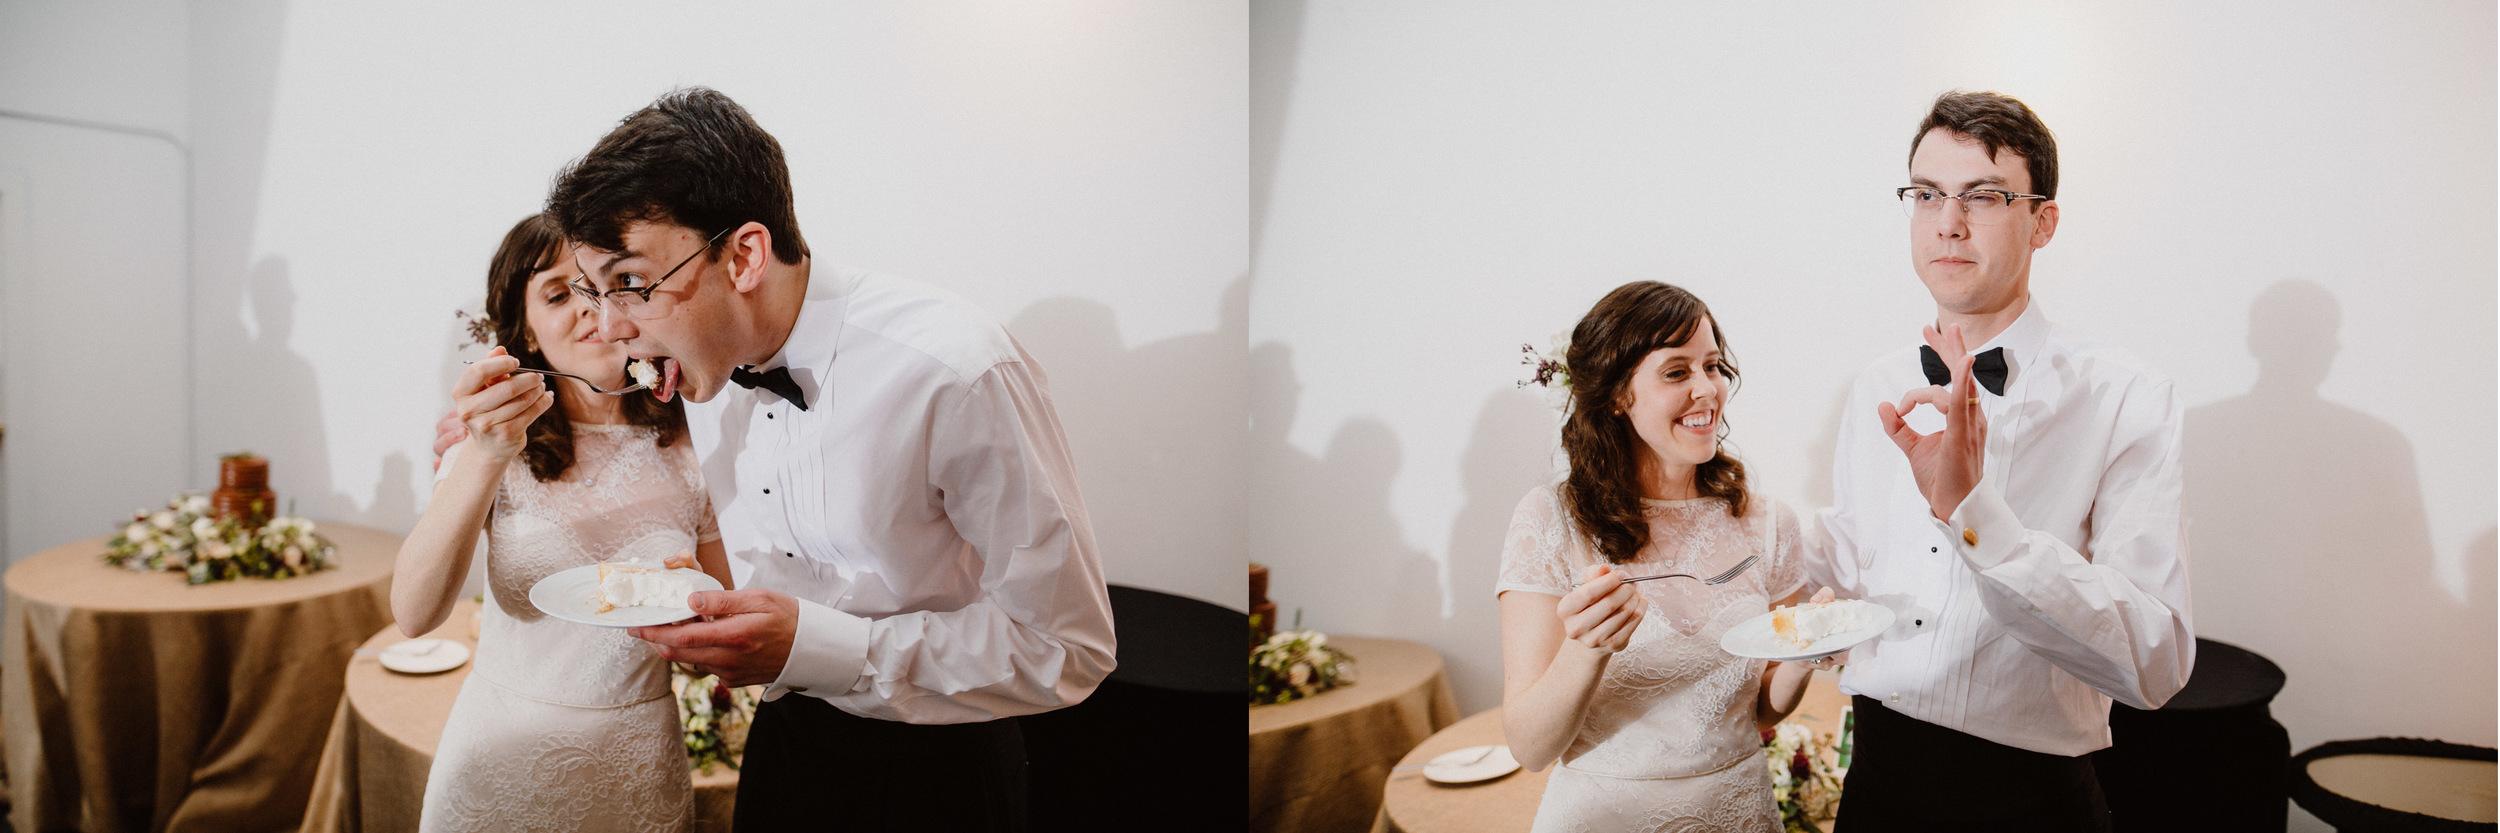 san antonio home wedding -6.jpg